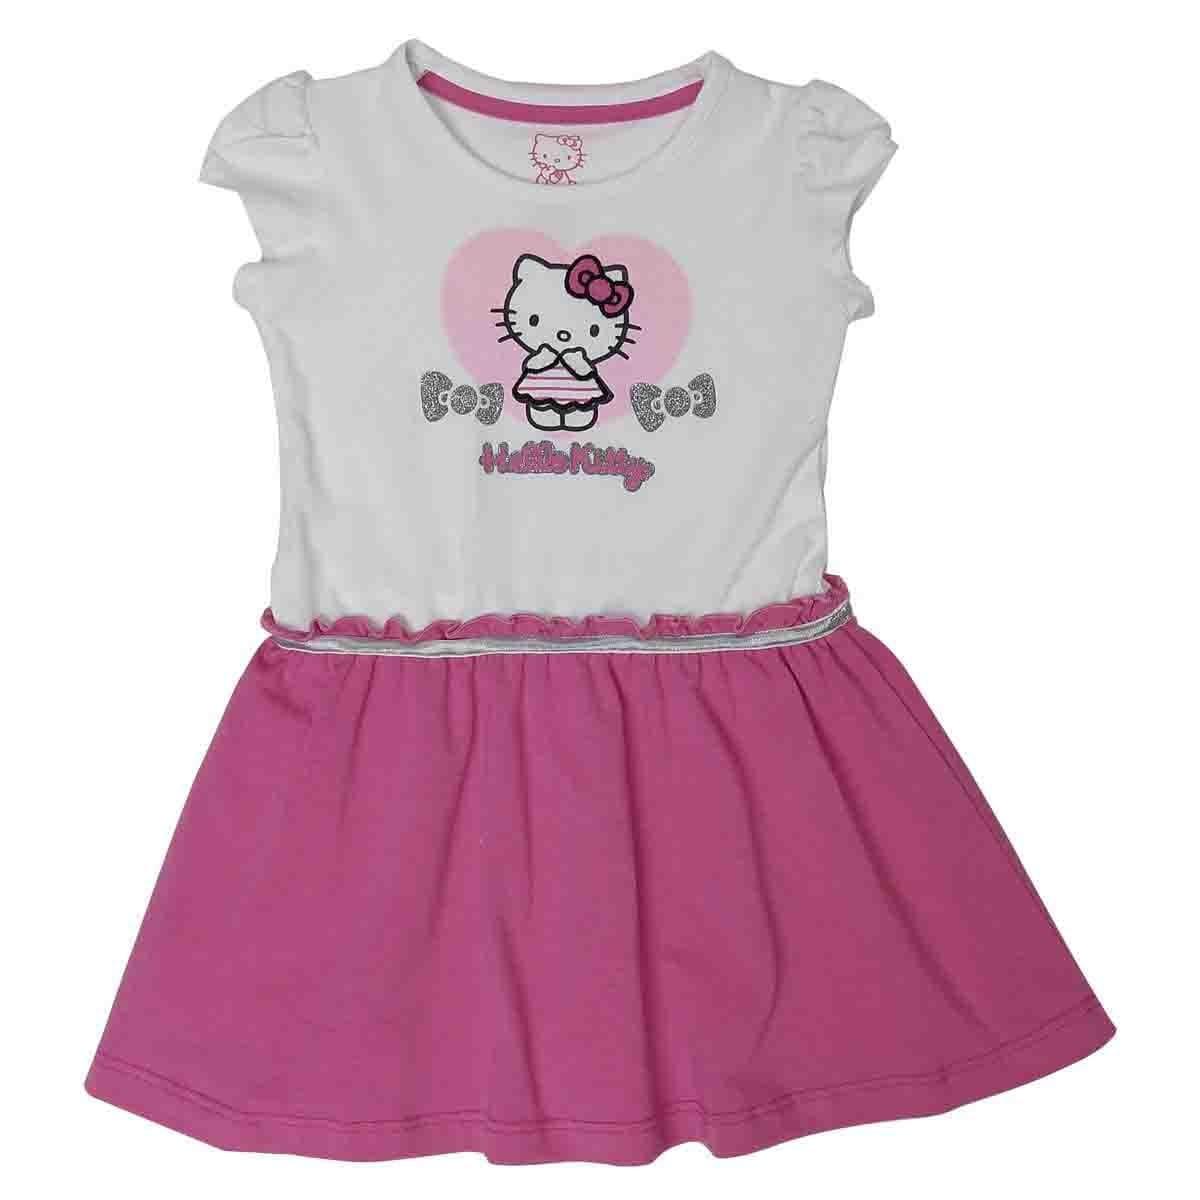 Vestido Manga Corta Estampado Hello Kitty para Bebé